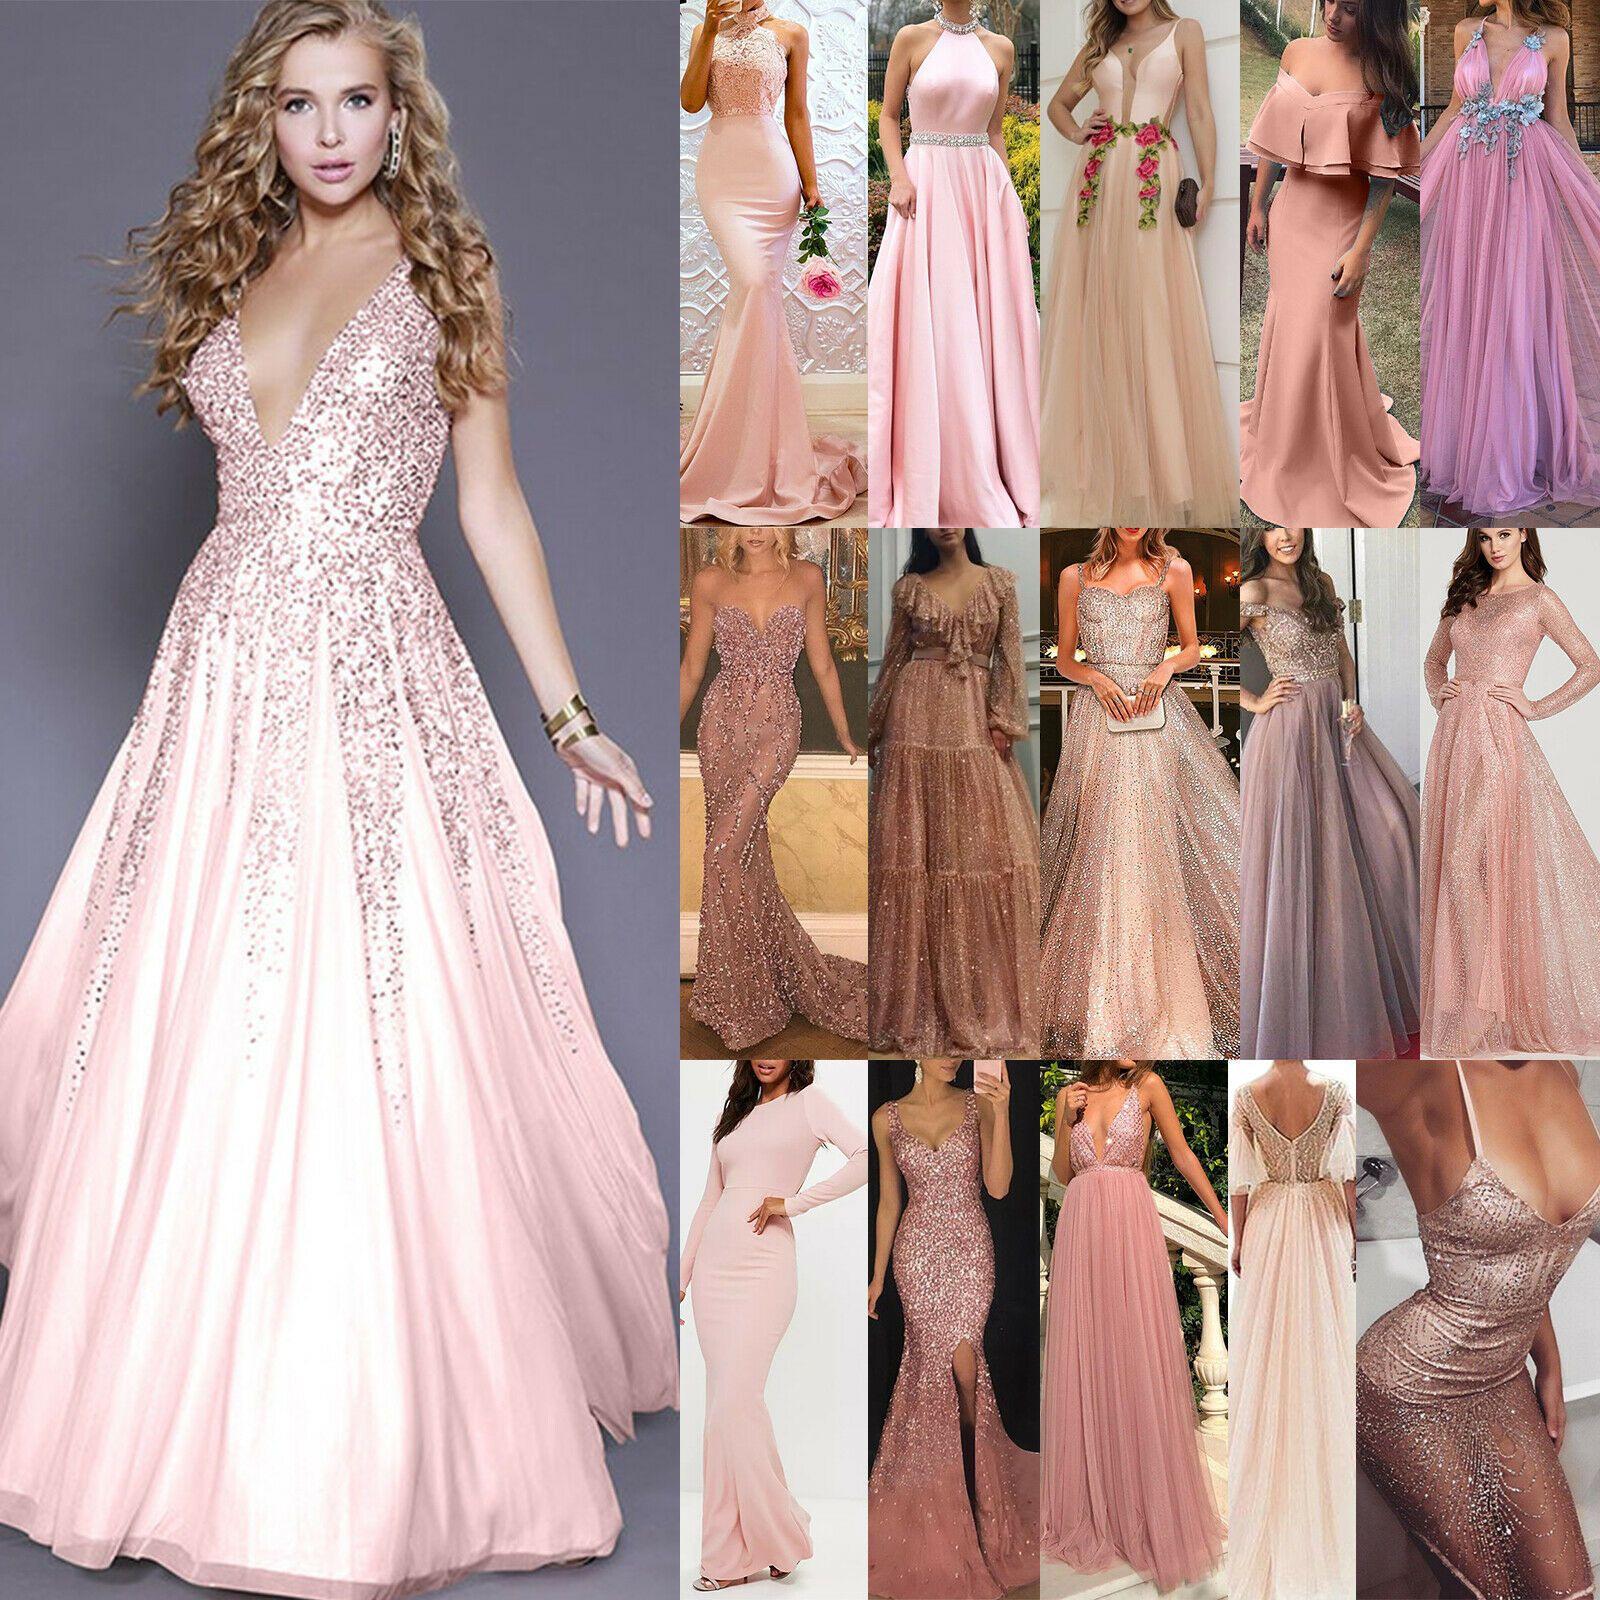 Designer Genial Abend Dress Girl Bester Preis13 Einfach Abend Dress Girl Spezialgebiet